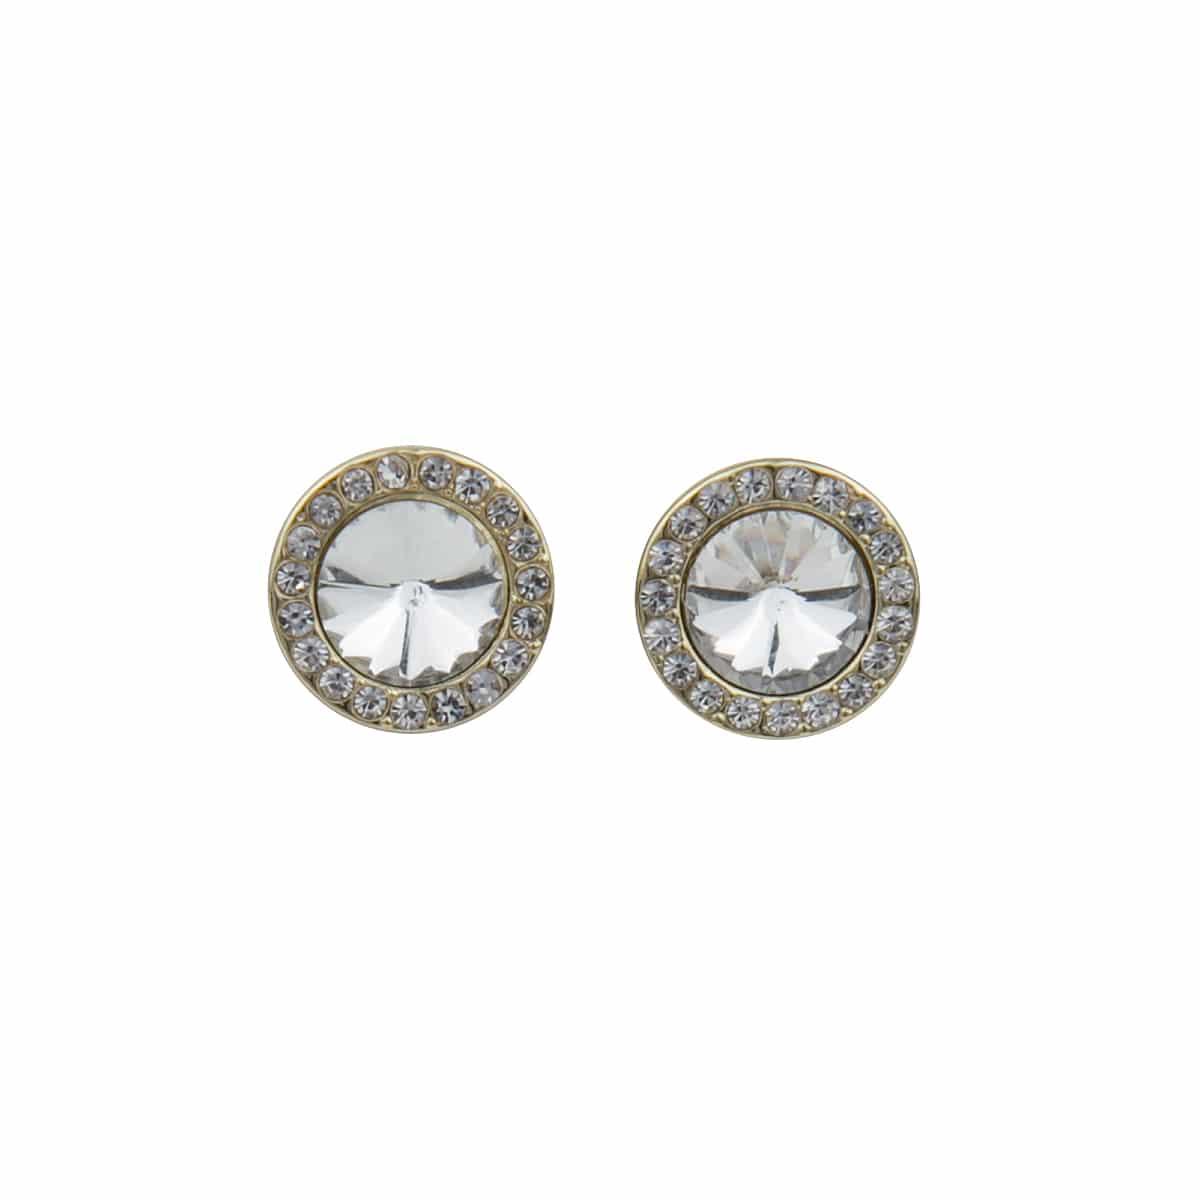 Swire-stone-ear-g-clear-793-5400251